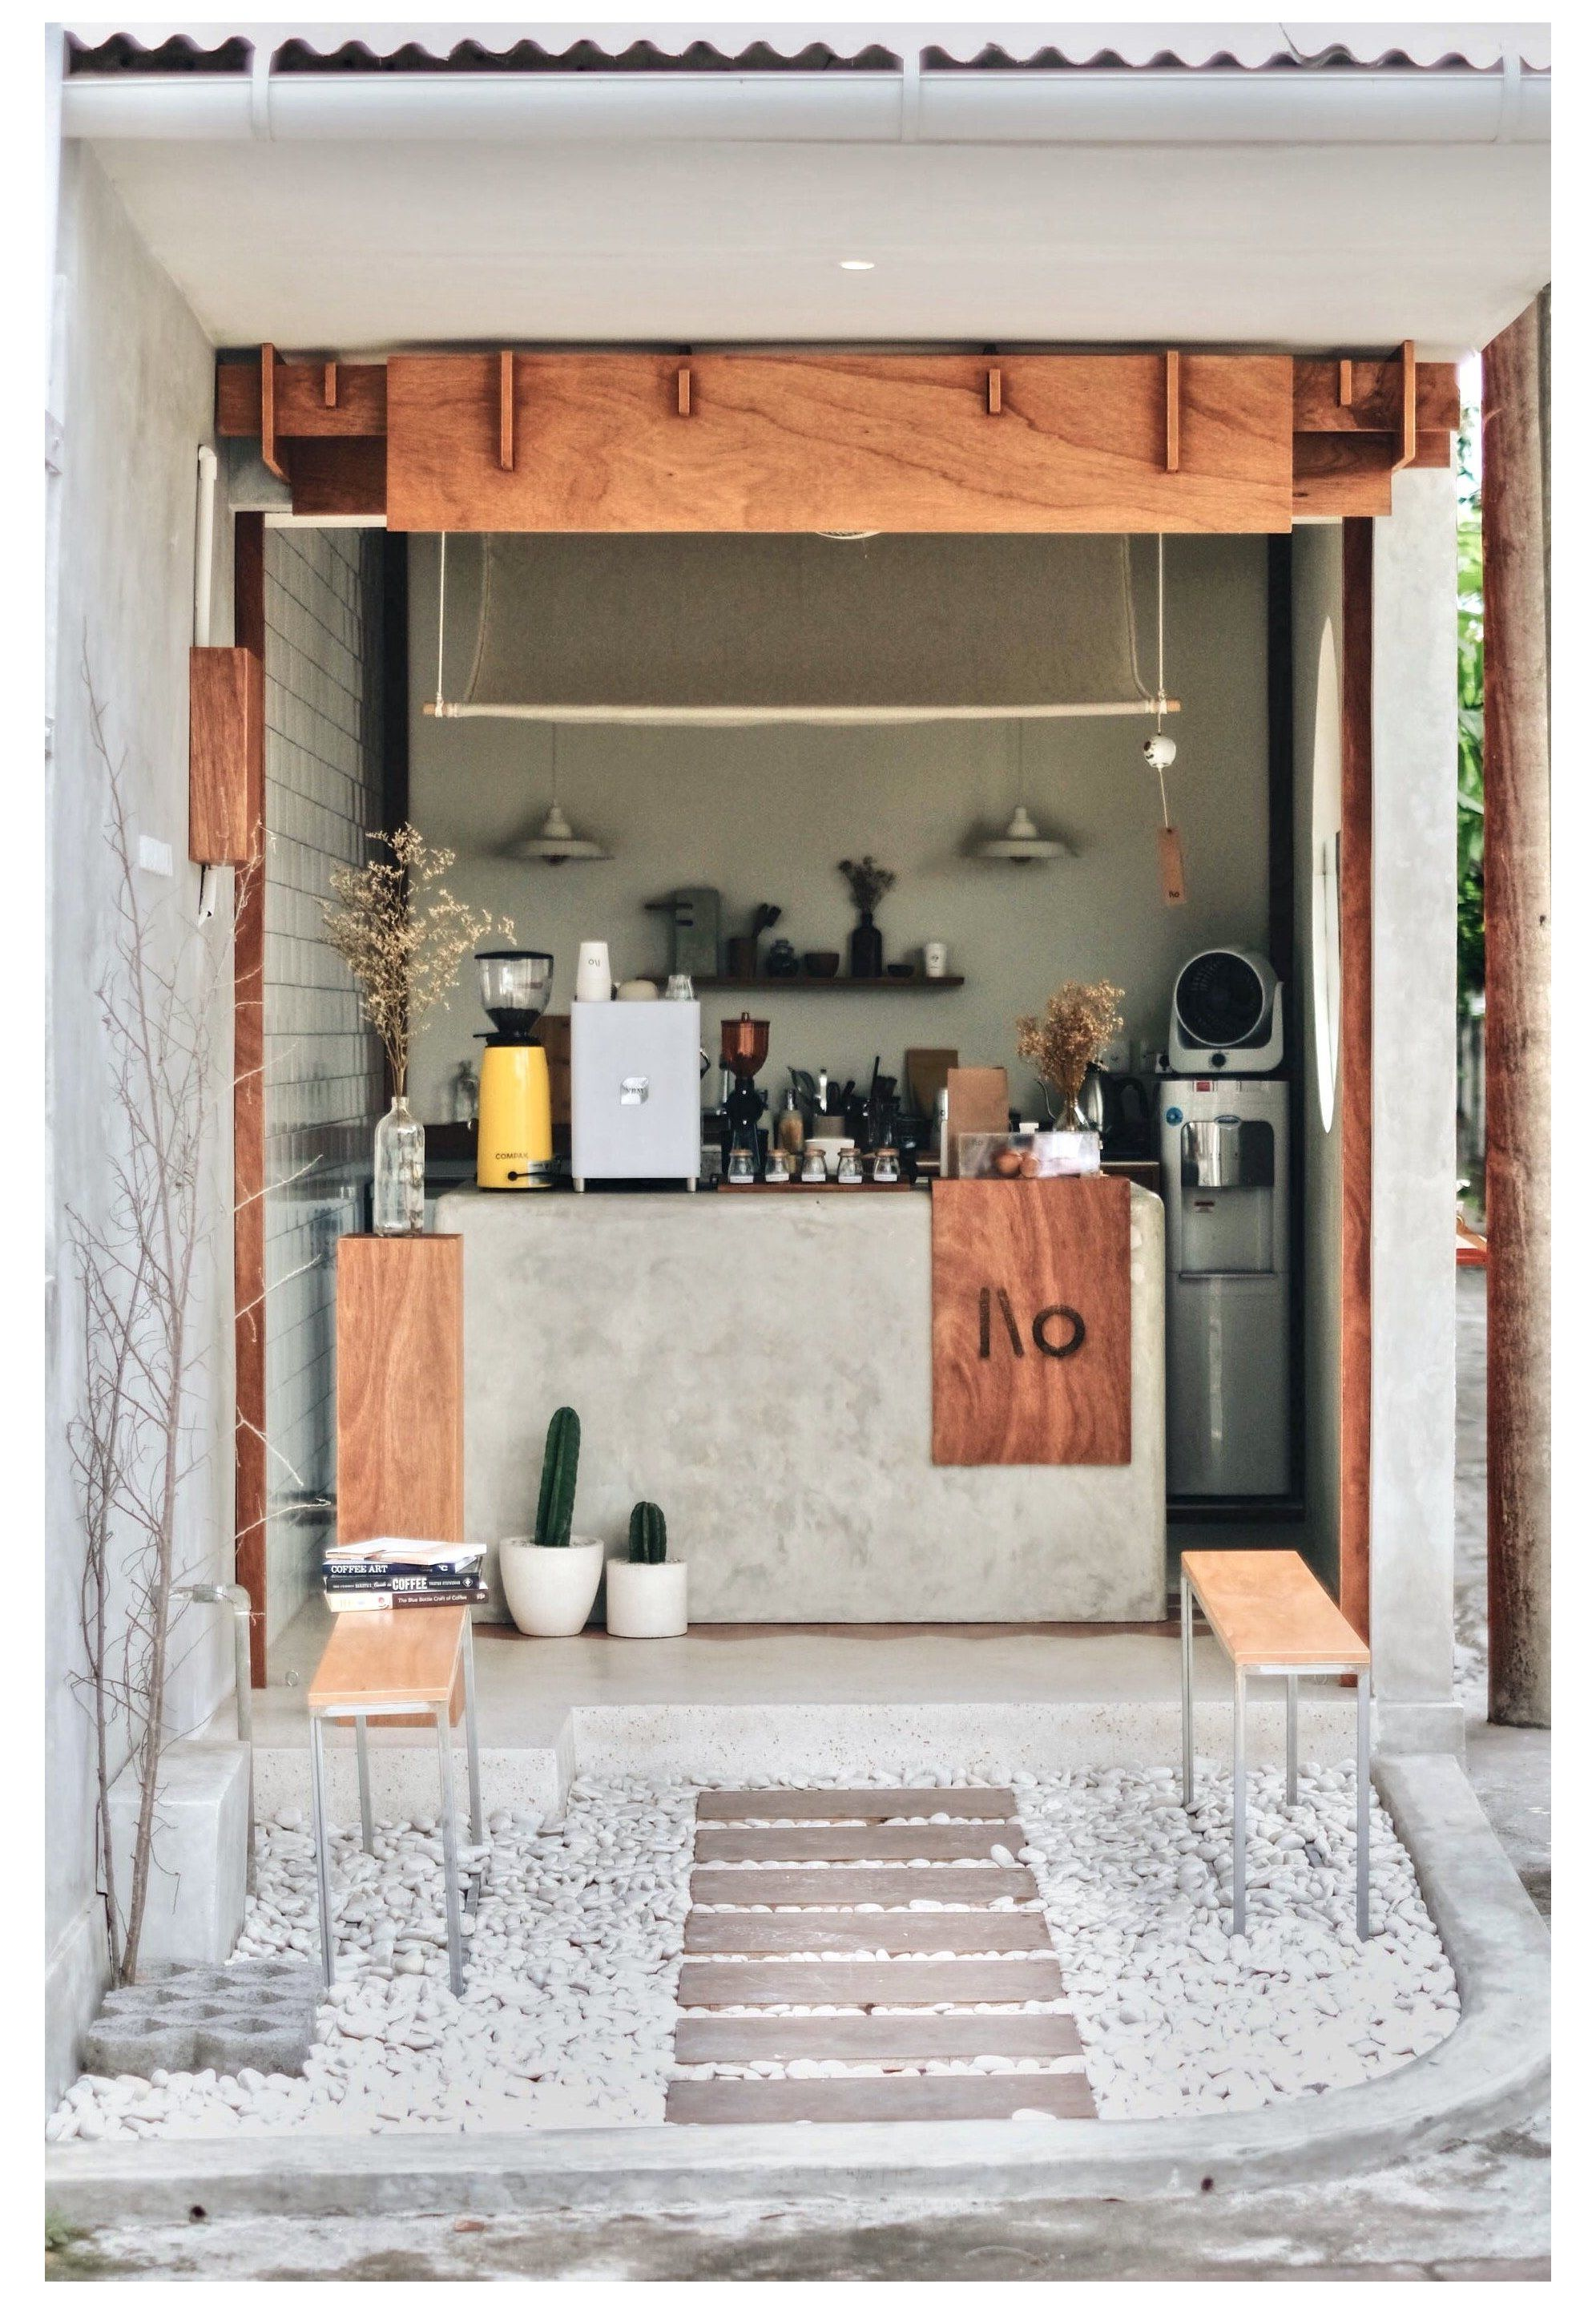 Mannaka Bali Very Small Coffee Shop Ideas Cafe Interior Design Coffee Shop Interior Design Cafe Shop Design Home cafe room design